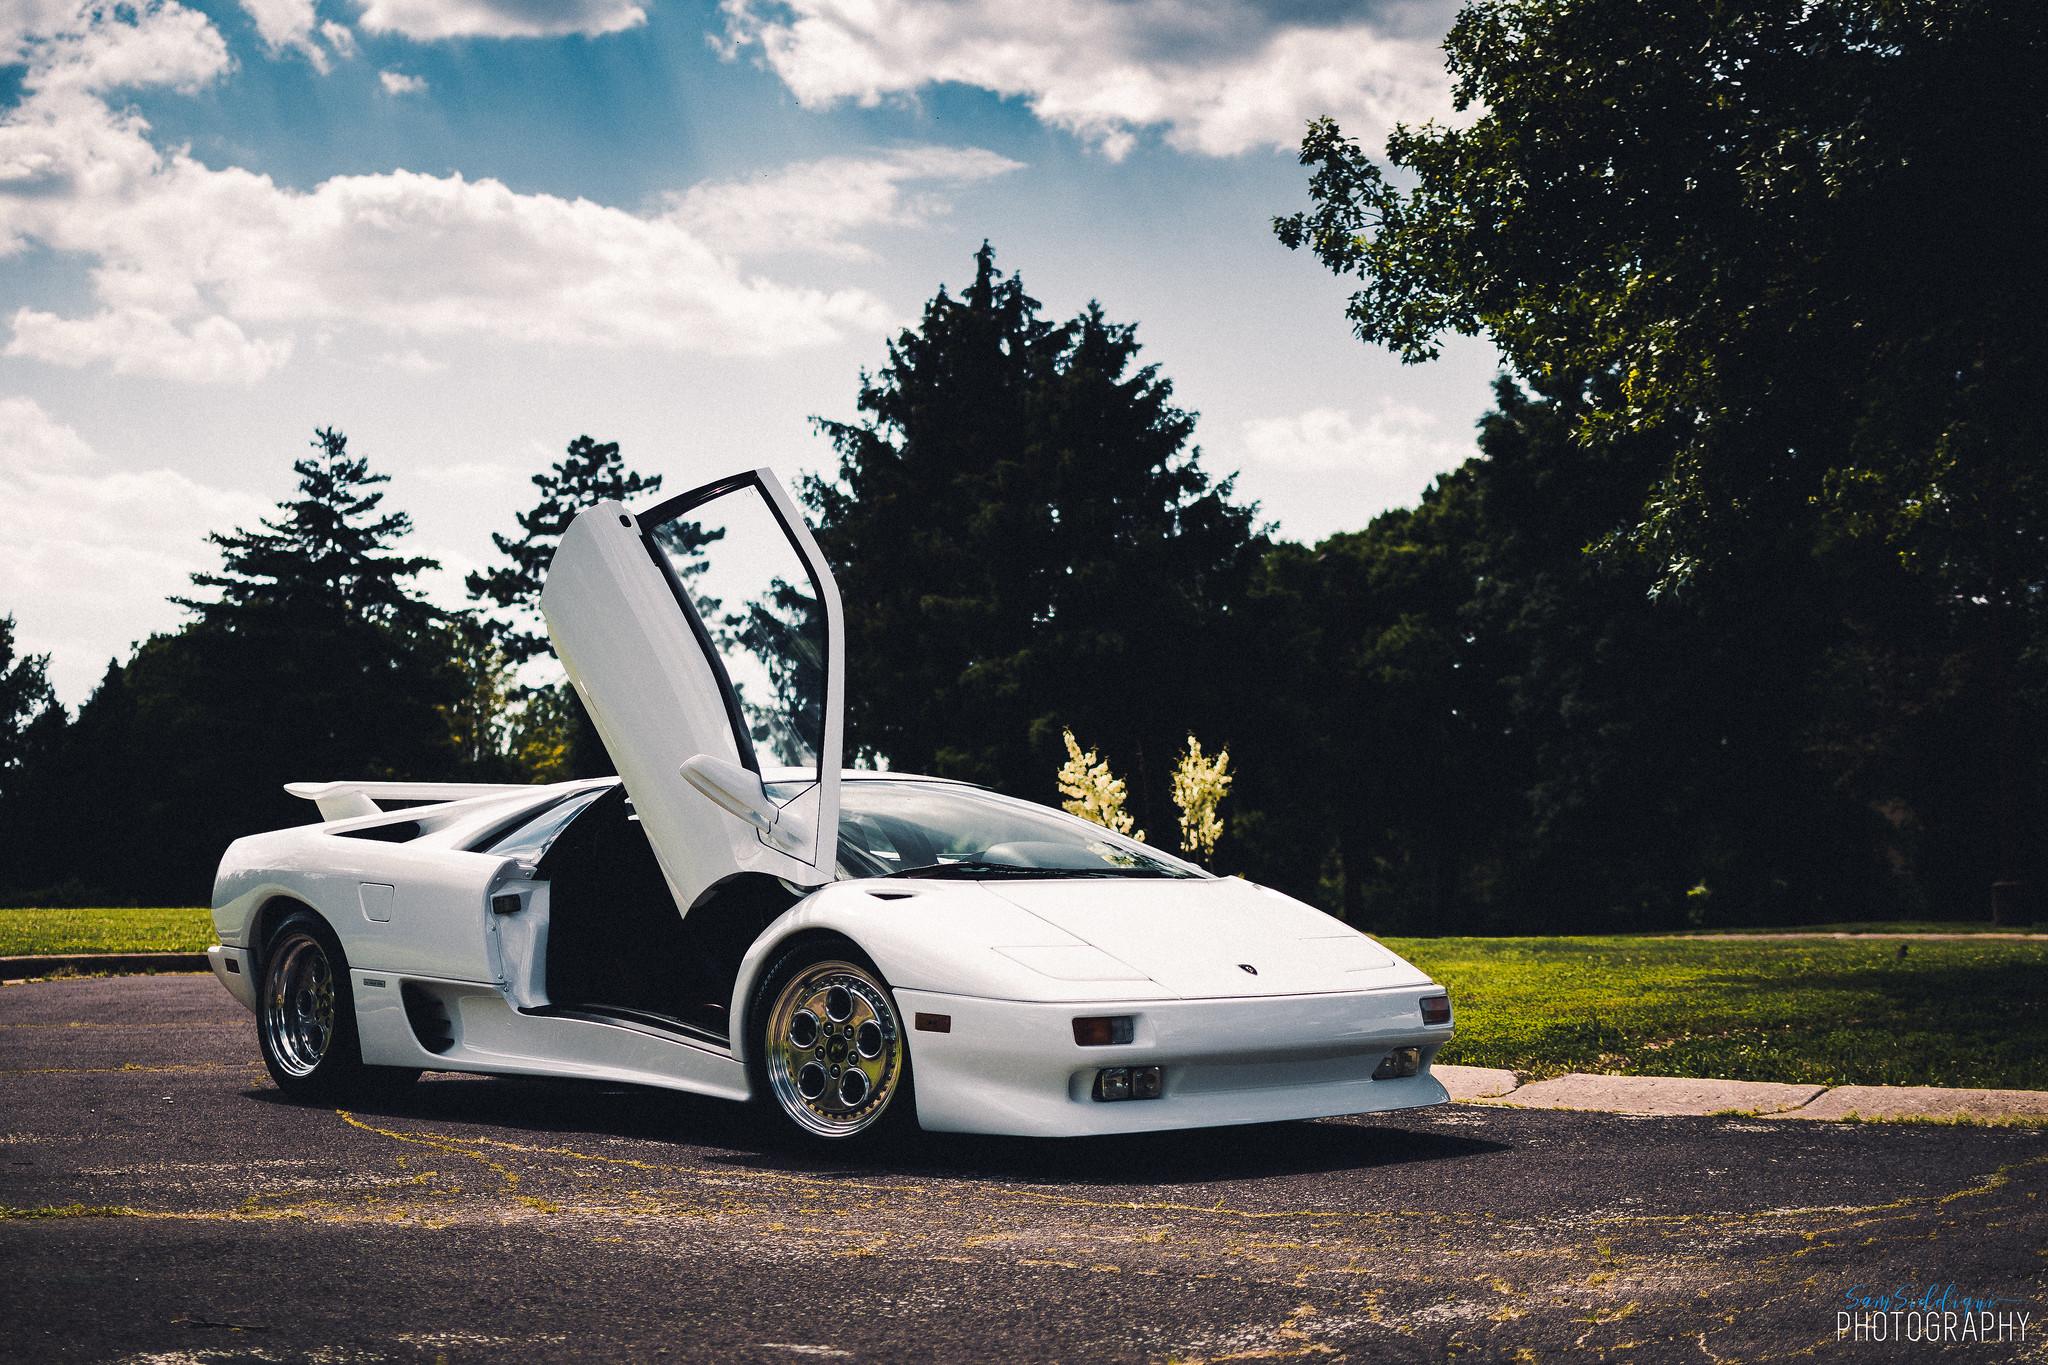 1991 White Lamborghini Diablo one open door